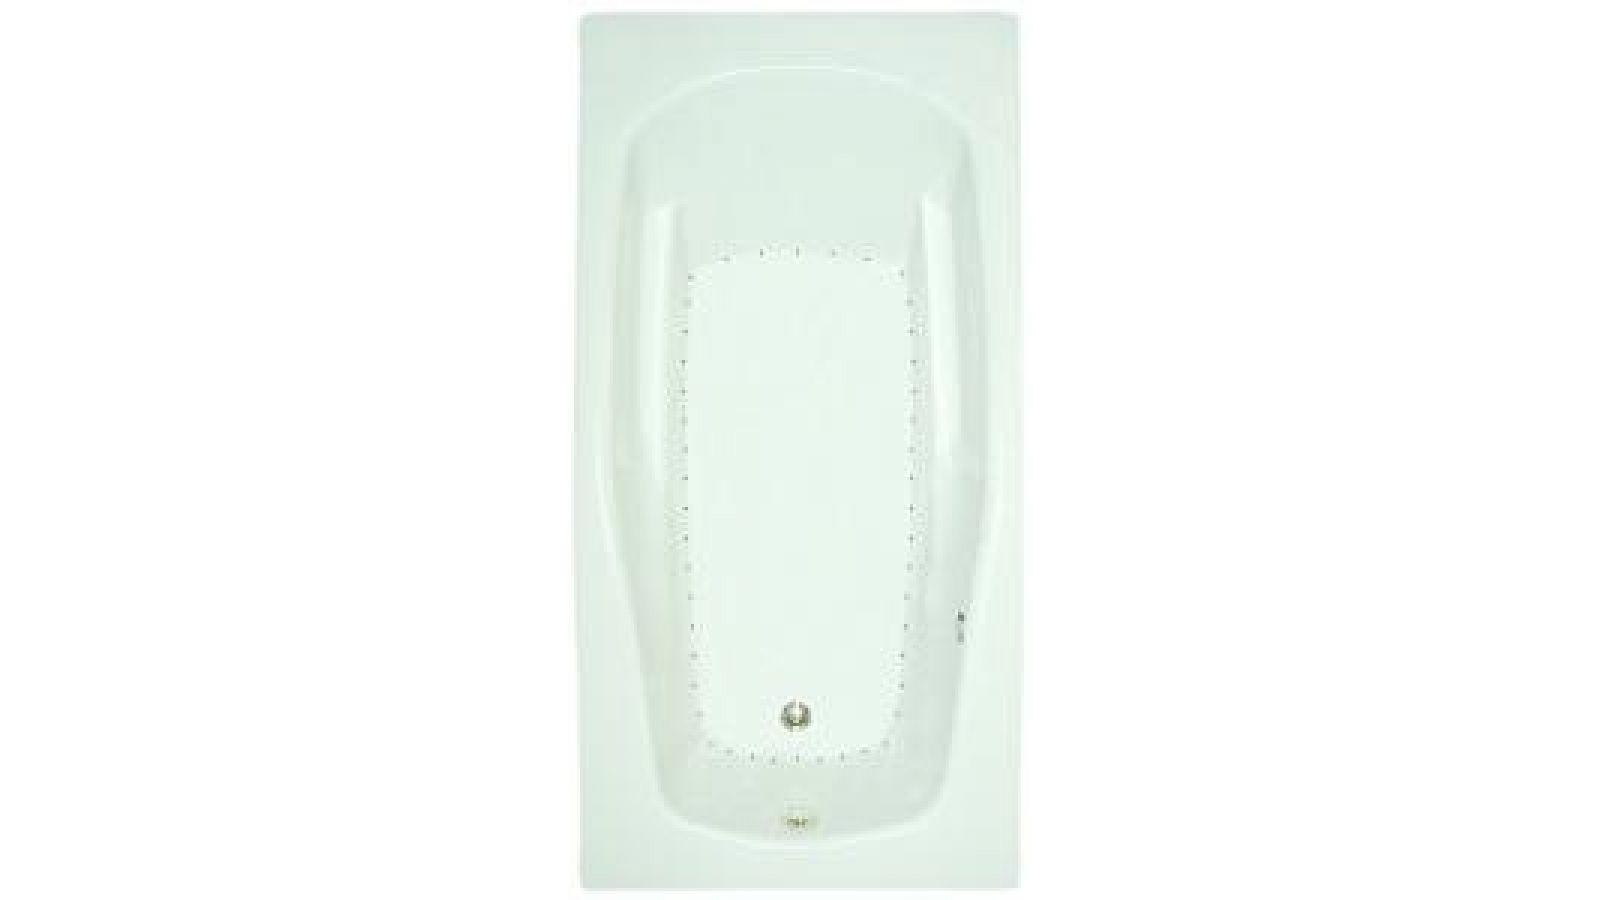 Pro-Fit 3672 Rectangular Air Massage Bath